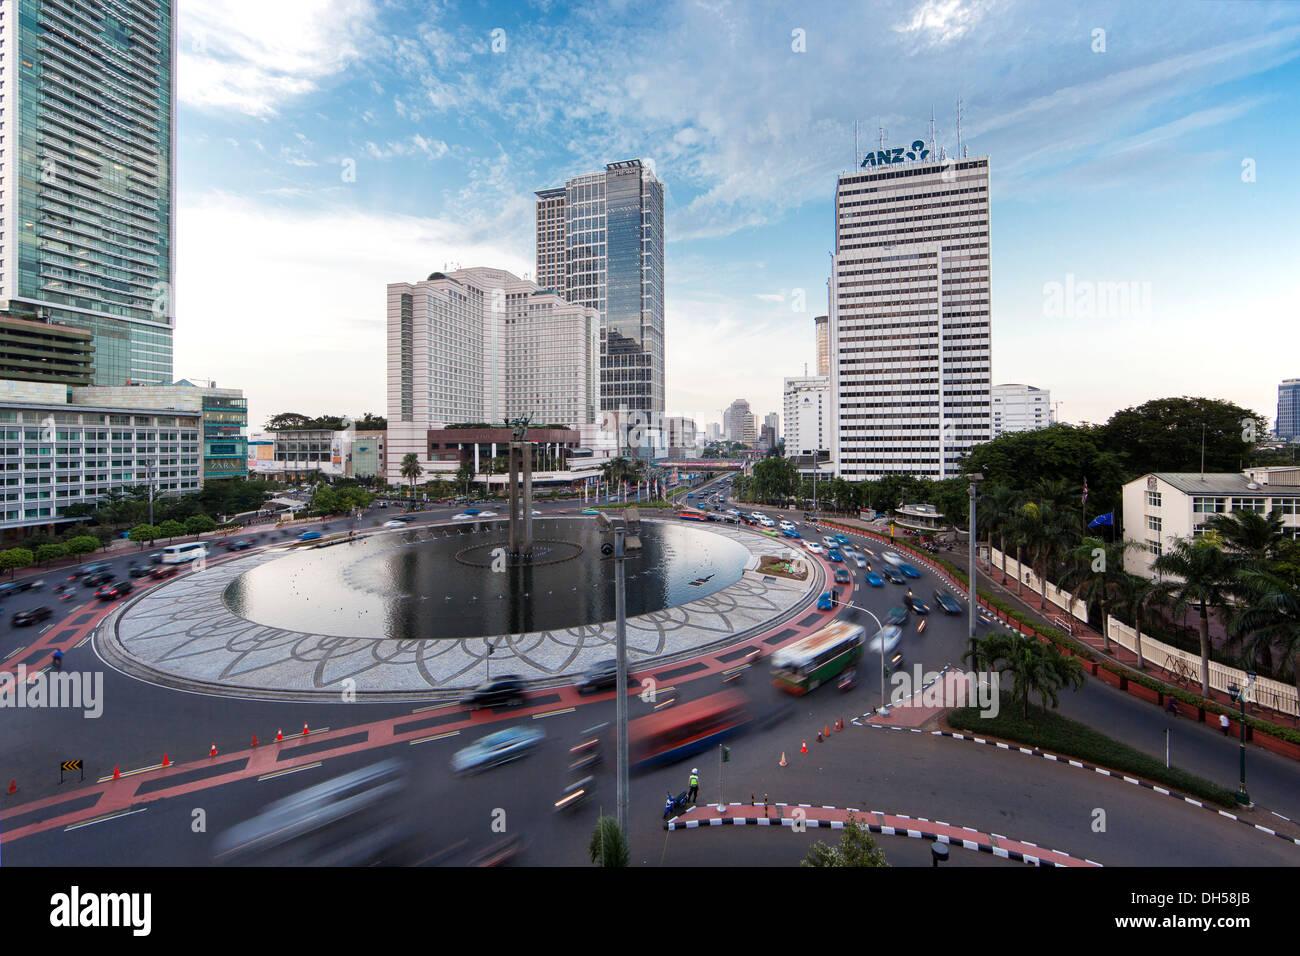 Roundabout with the Grand Hyatt Jakarta Hotel, Jakarta, Java, Indonesia - Stock Image